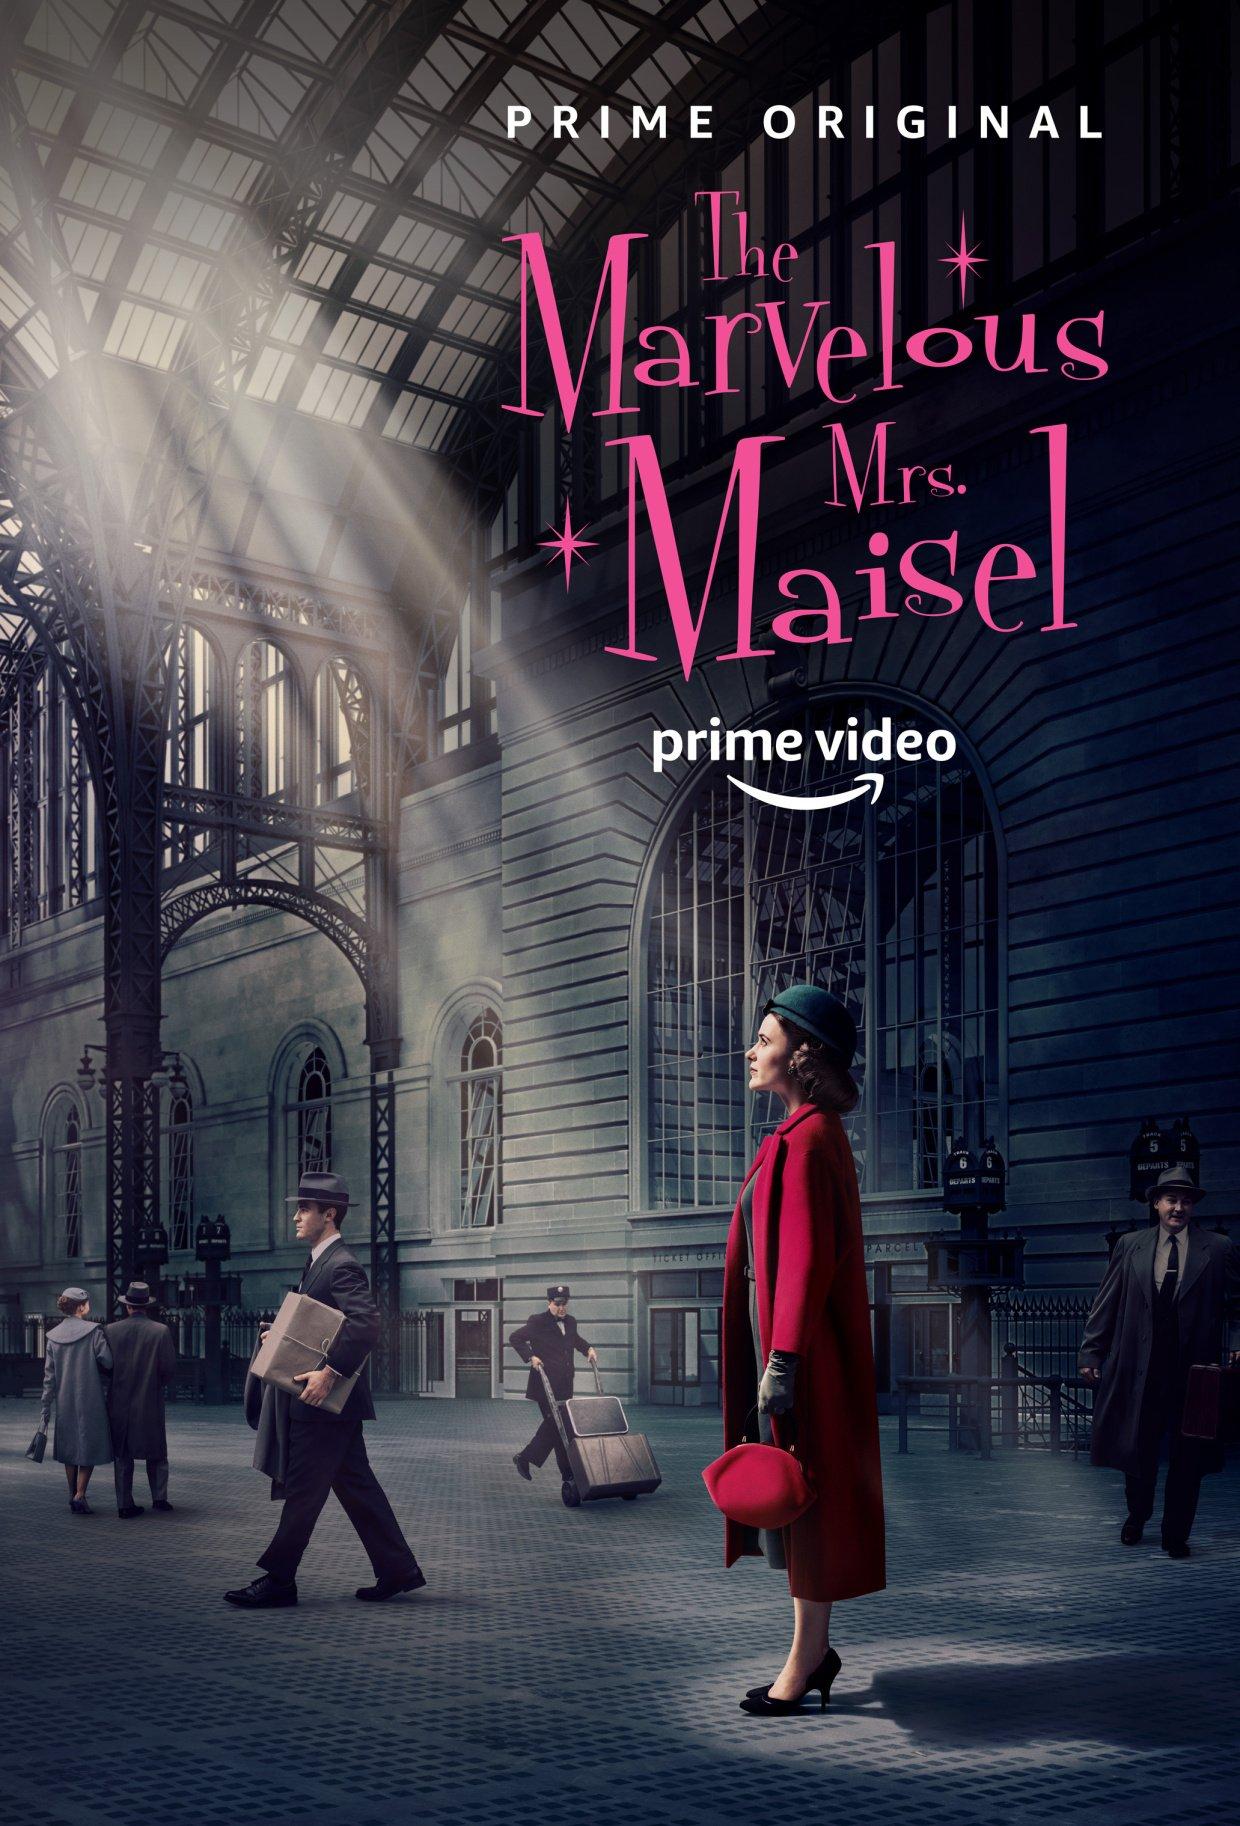 The Marvelous Mrs. Maisel - plakat 2. sezonu